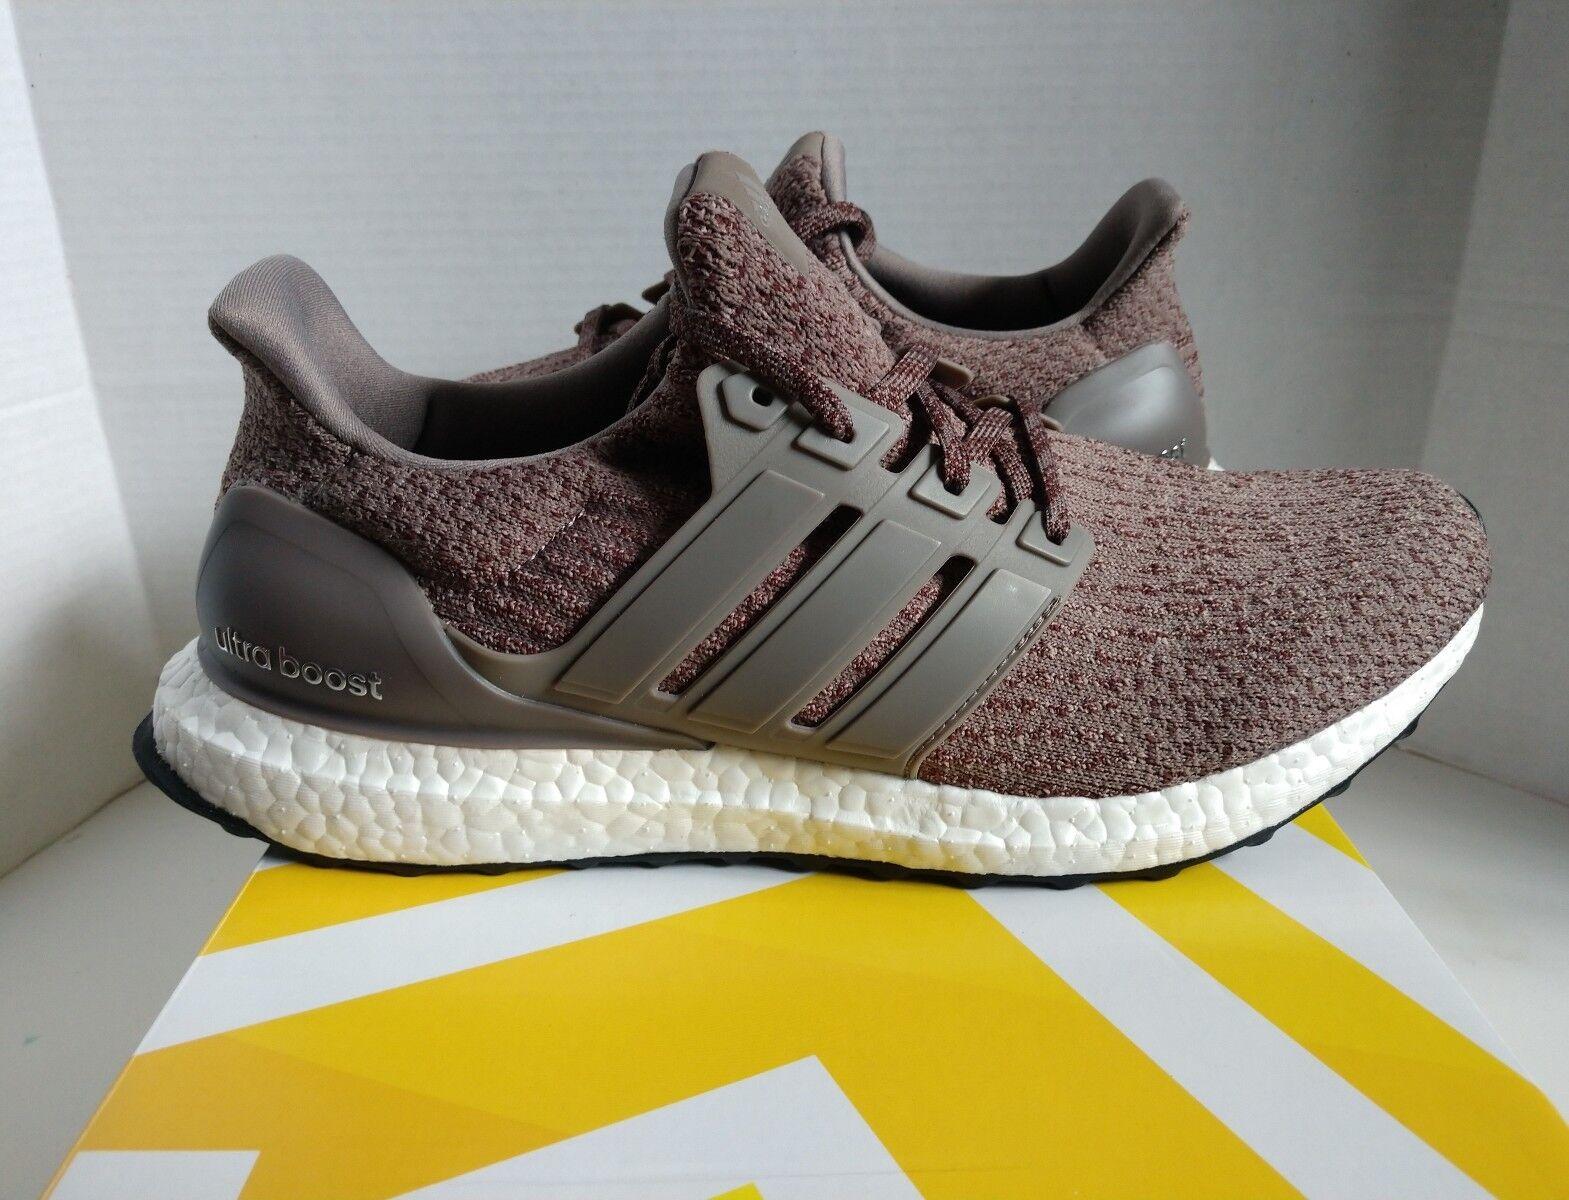 New Adidas Ultra Boost 3.0 Tech Earth Vapour Grey Running Shoe CG3040 Men's 9.5